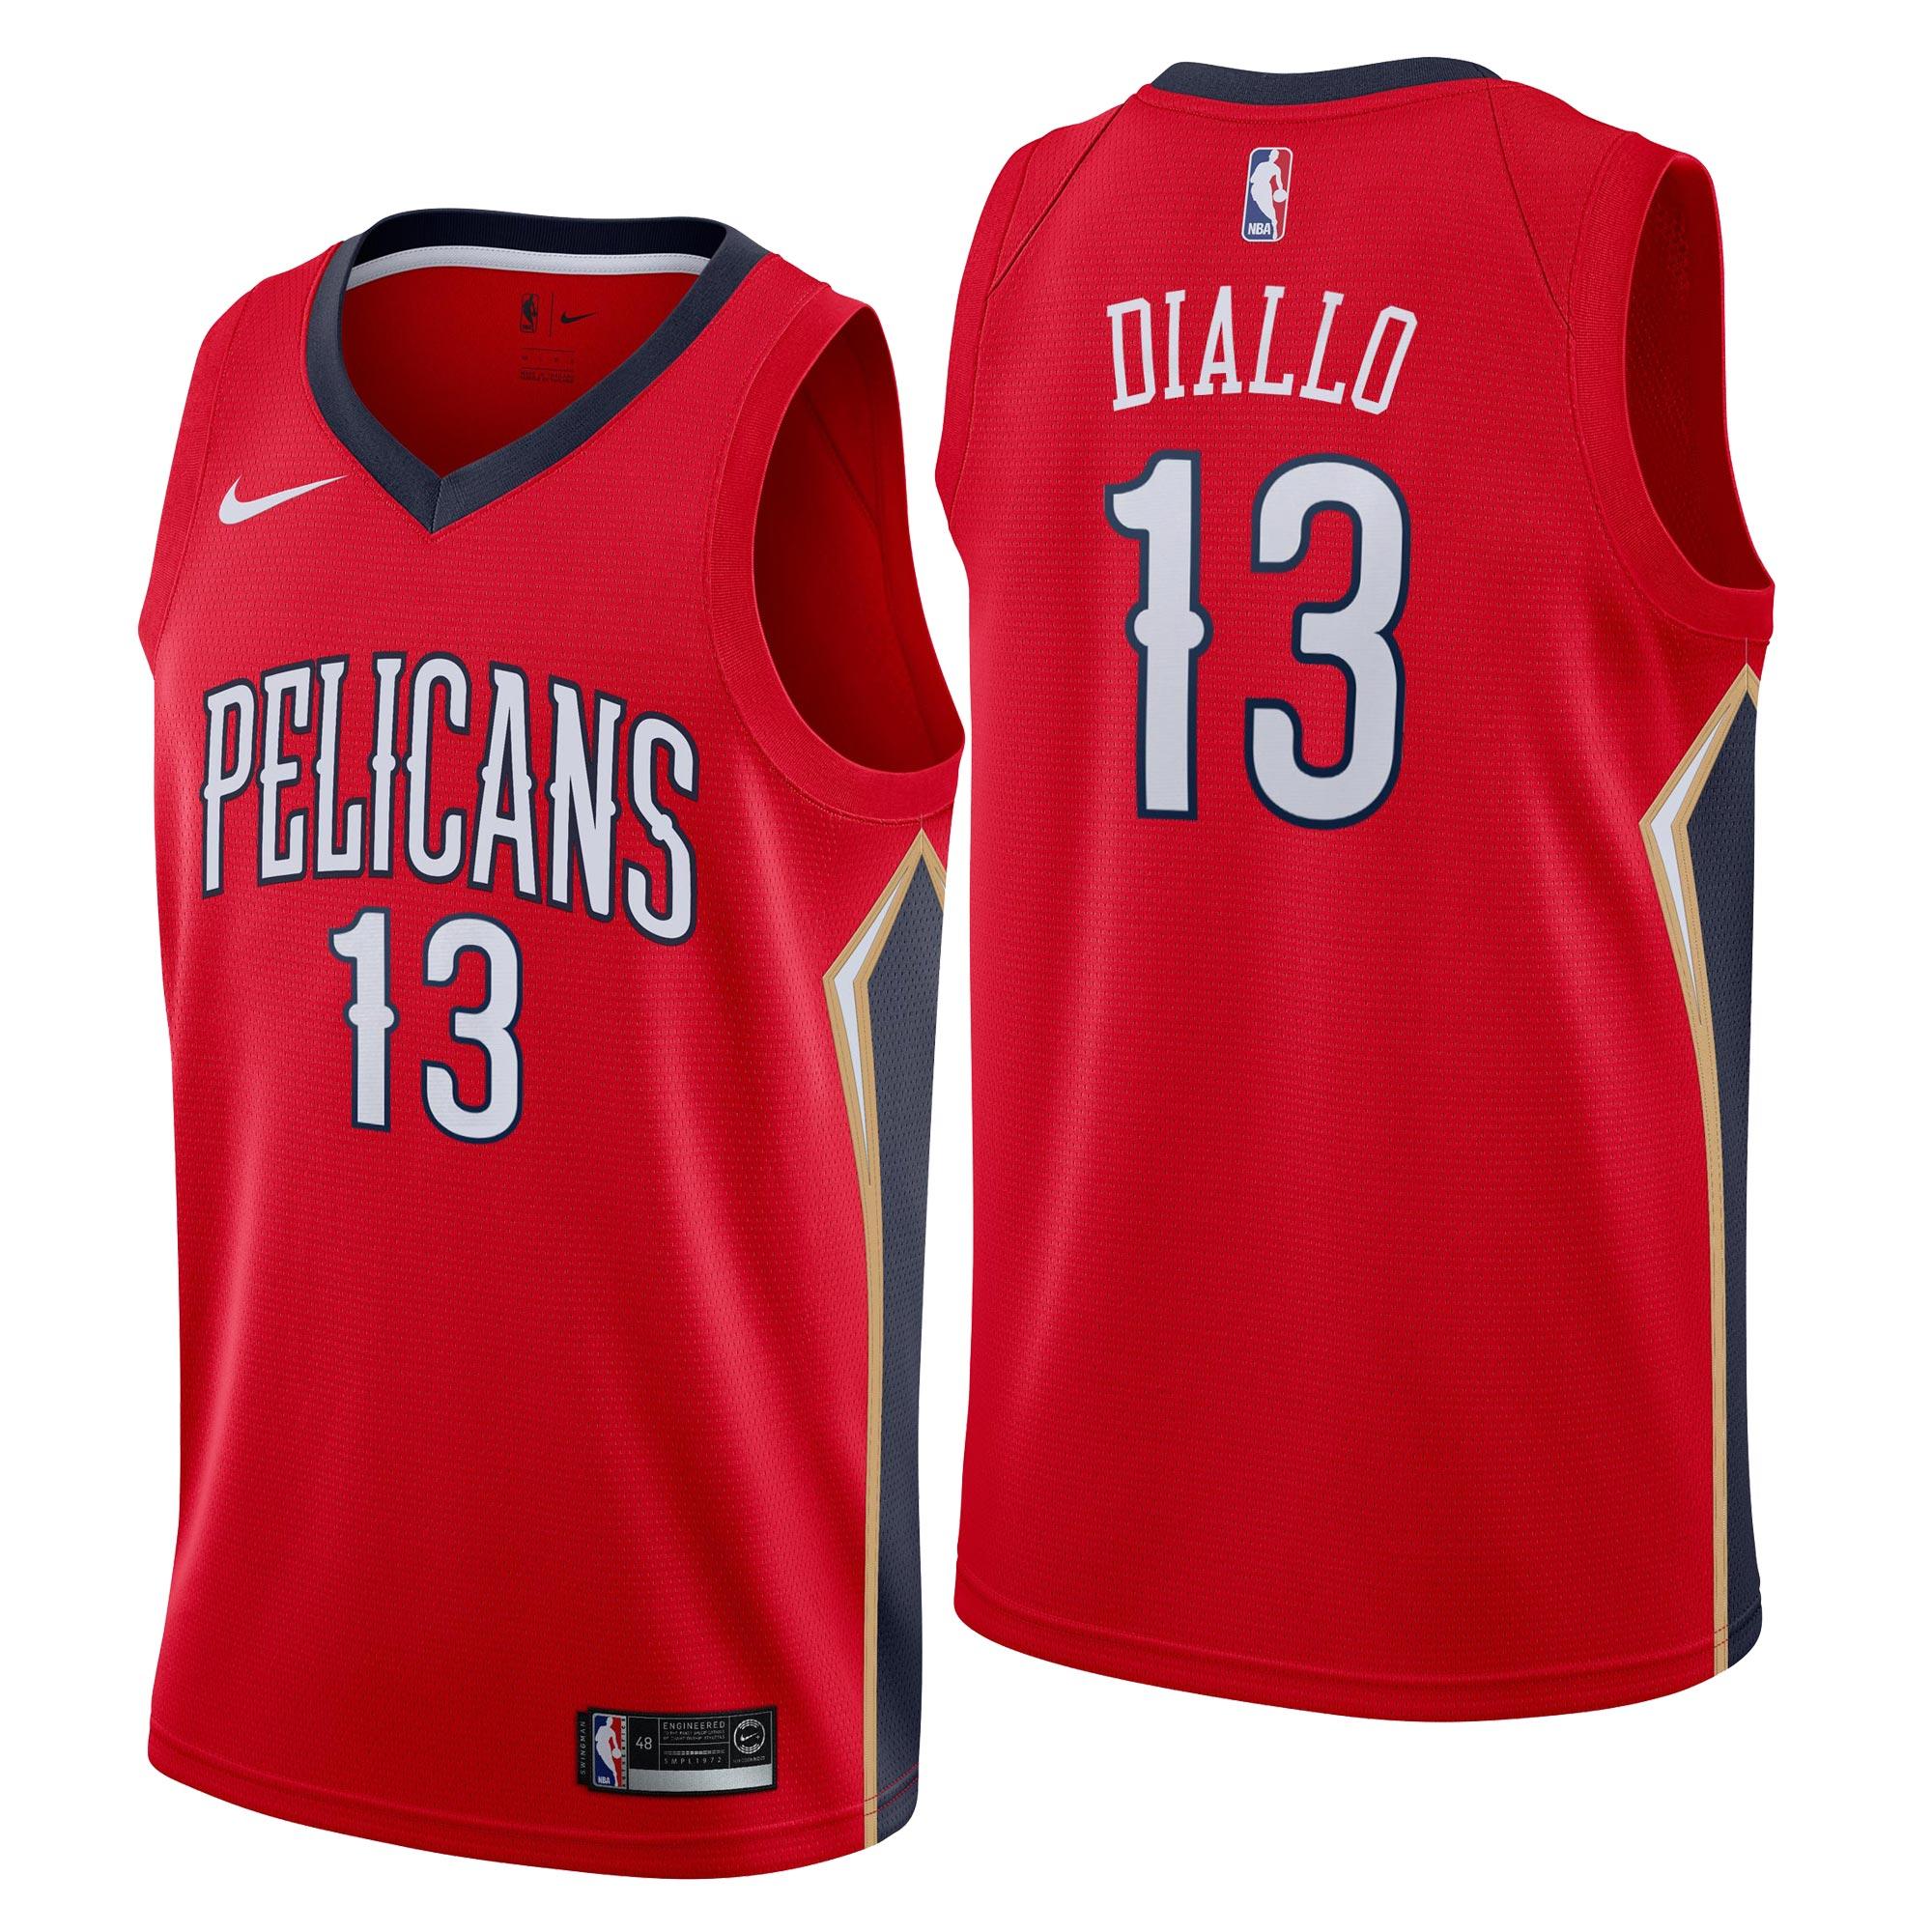 New Orleans Pelicans Nike Statement Swingman Camiseta de la NBA - Cheick Diallo - Hombre